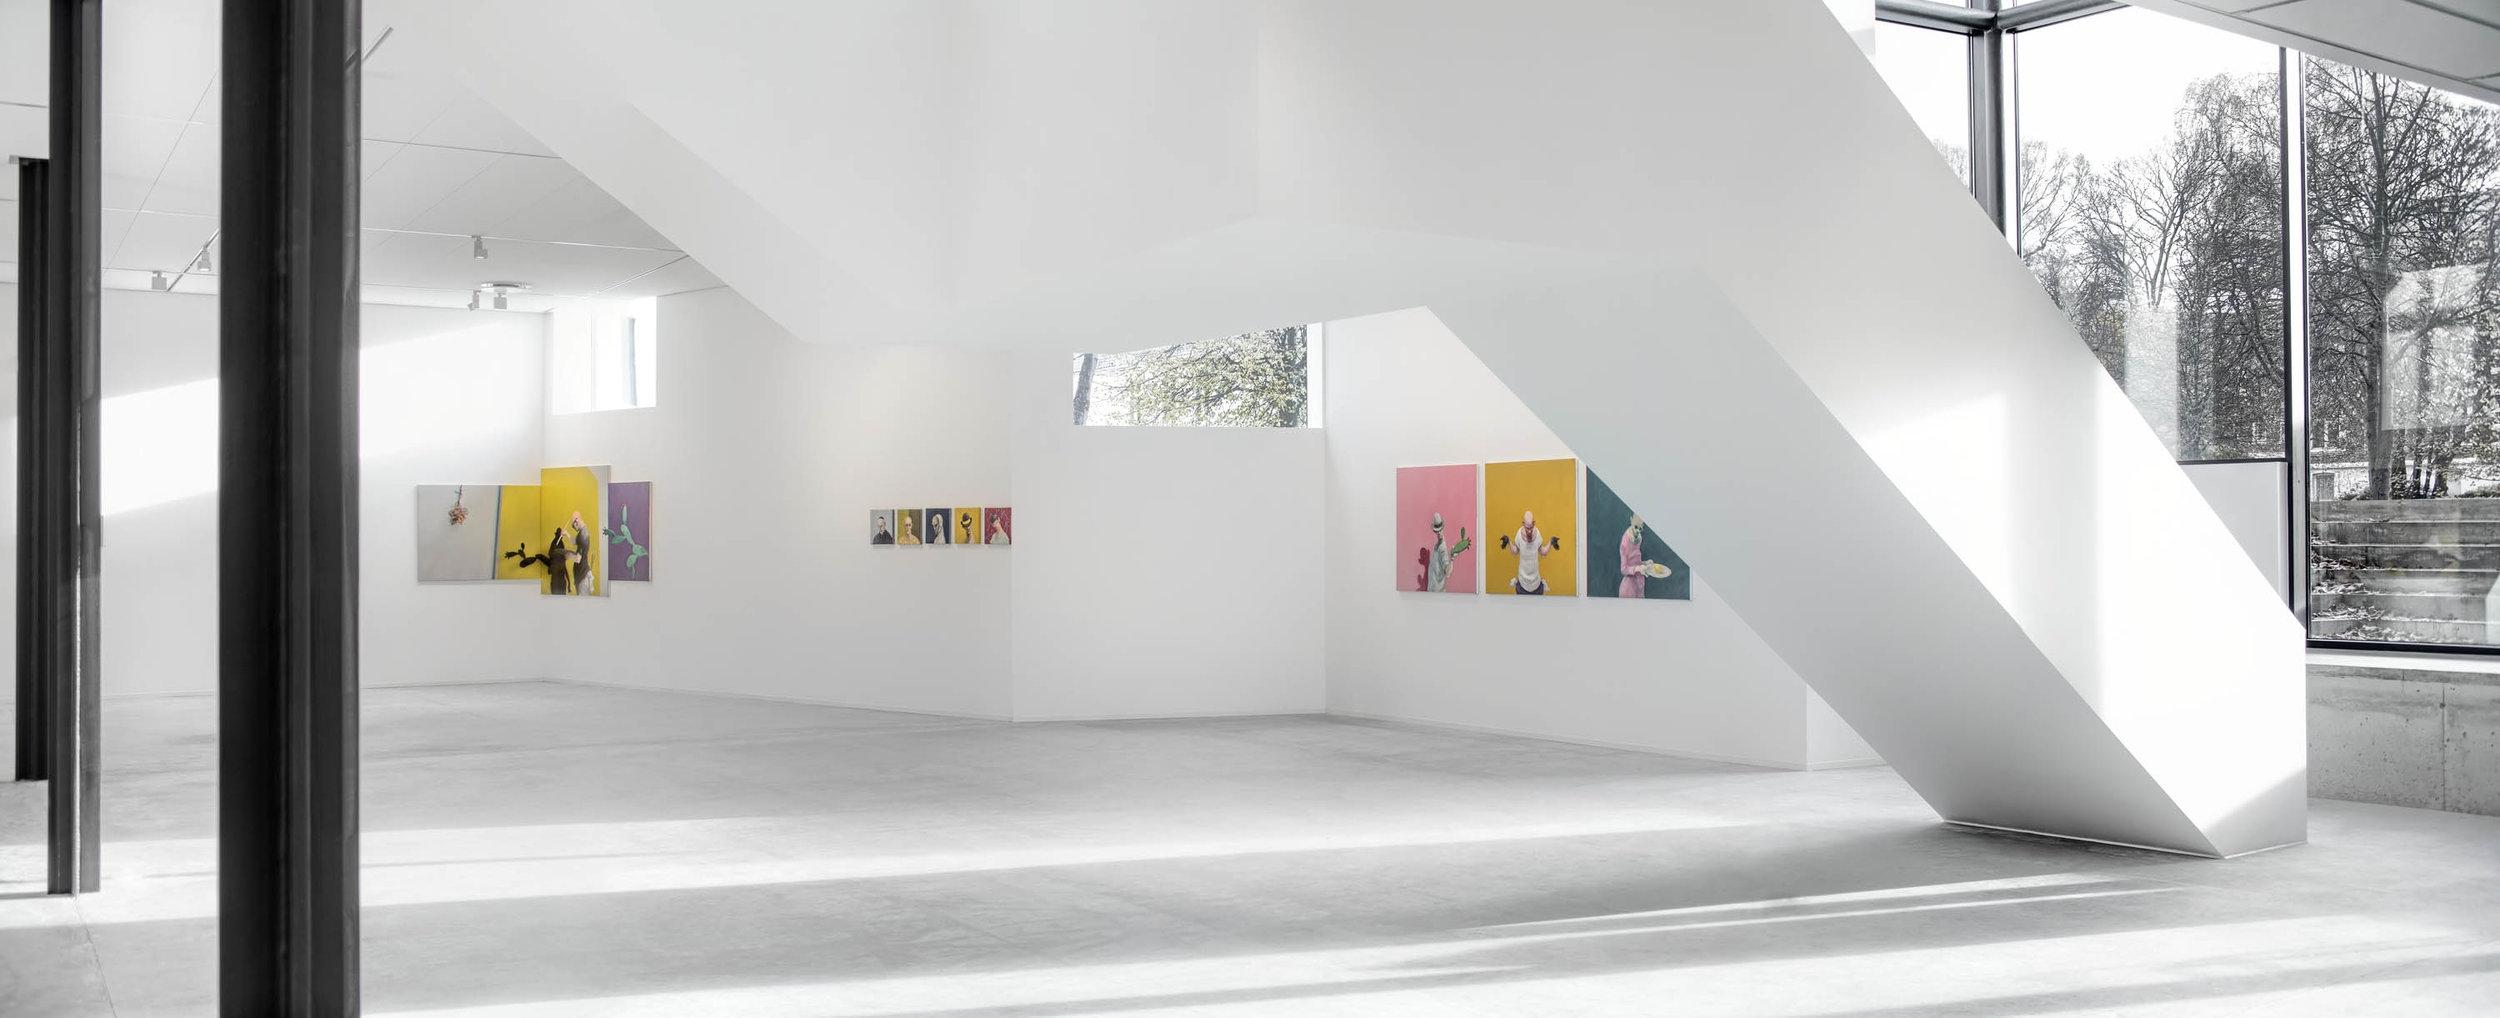 bge contemporary art project  photo : sindre ellingsen